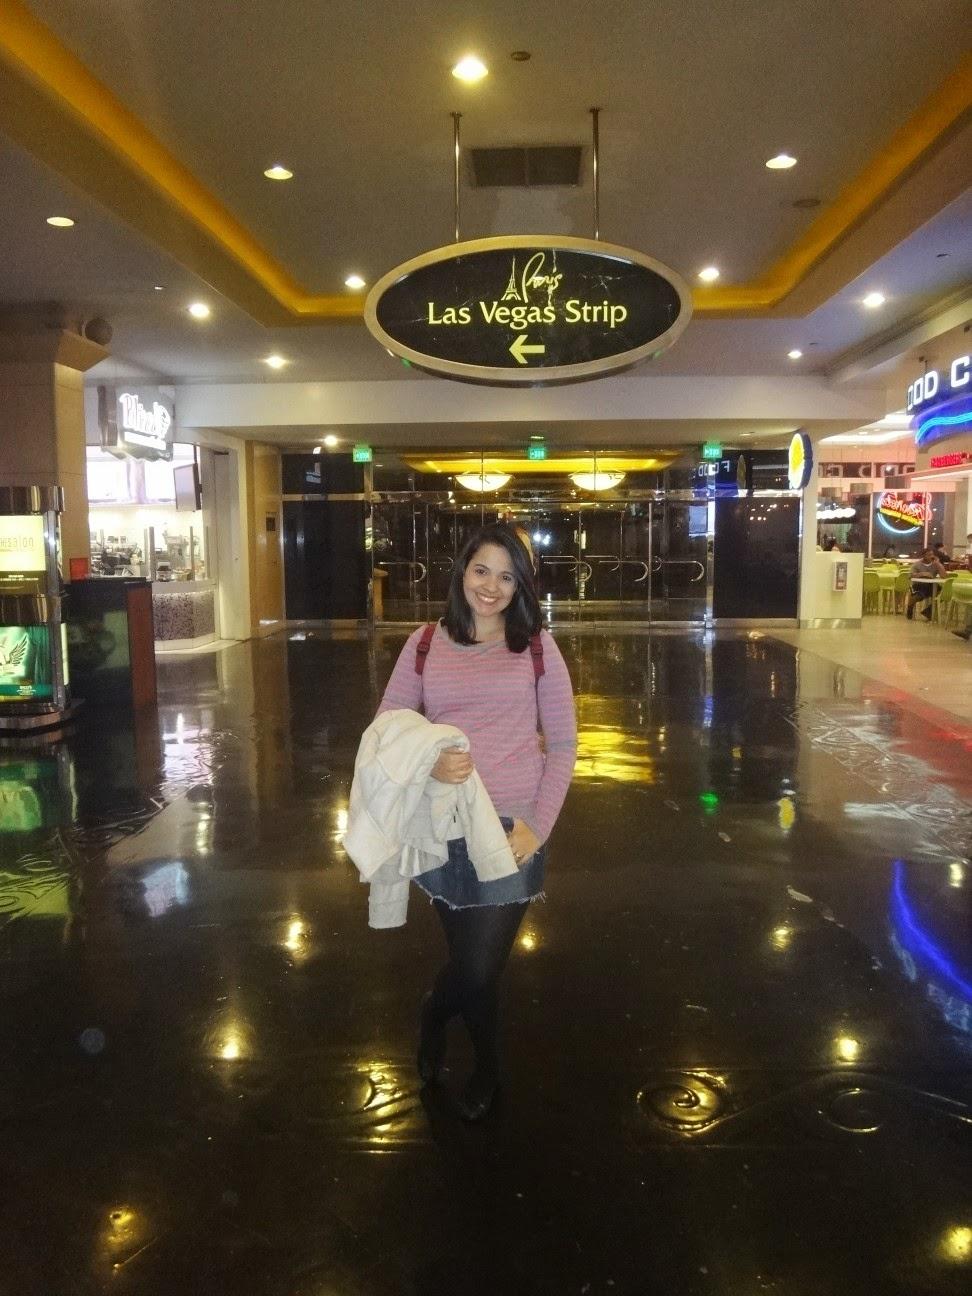 hotel Ballys - Las Vegas